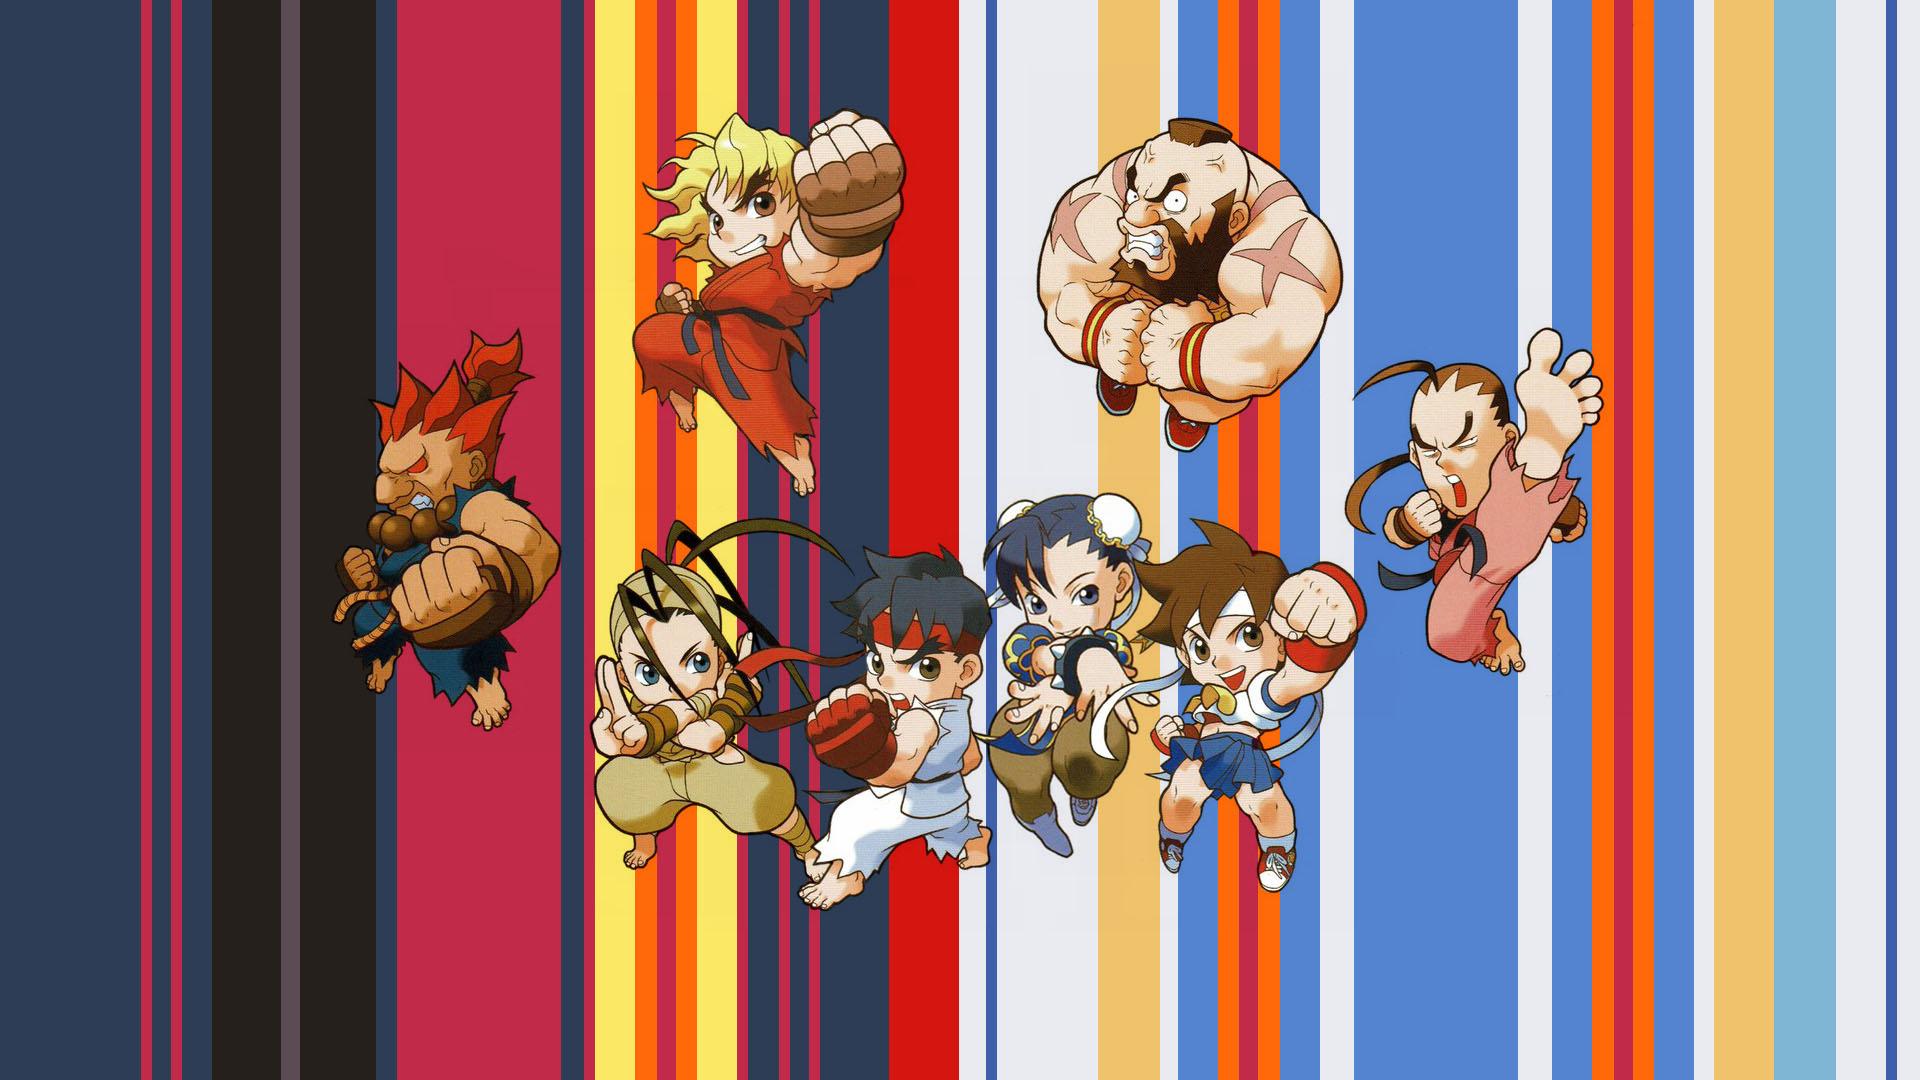 Anime 1920x1080 Street Fighter game art Ryu (Street Fighter) sakura (street fighter) Dan (Street Fighter) Ibuki (Street Fighter) Akuma Ken (Street Fighter) Zangief(street fighter) Puzzle Fighter chibi picture-in-picture video game art video game girls video game man video game warriors video games Chun-Li